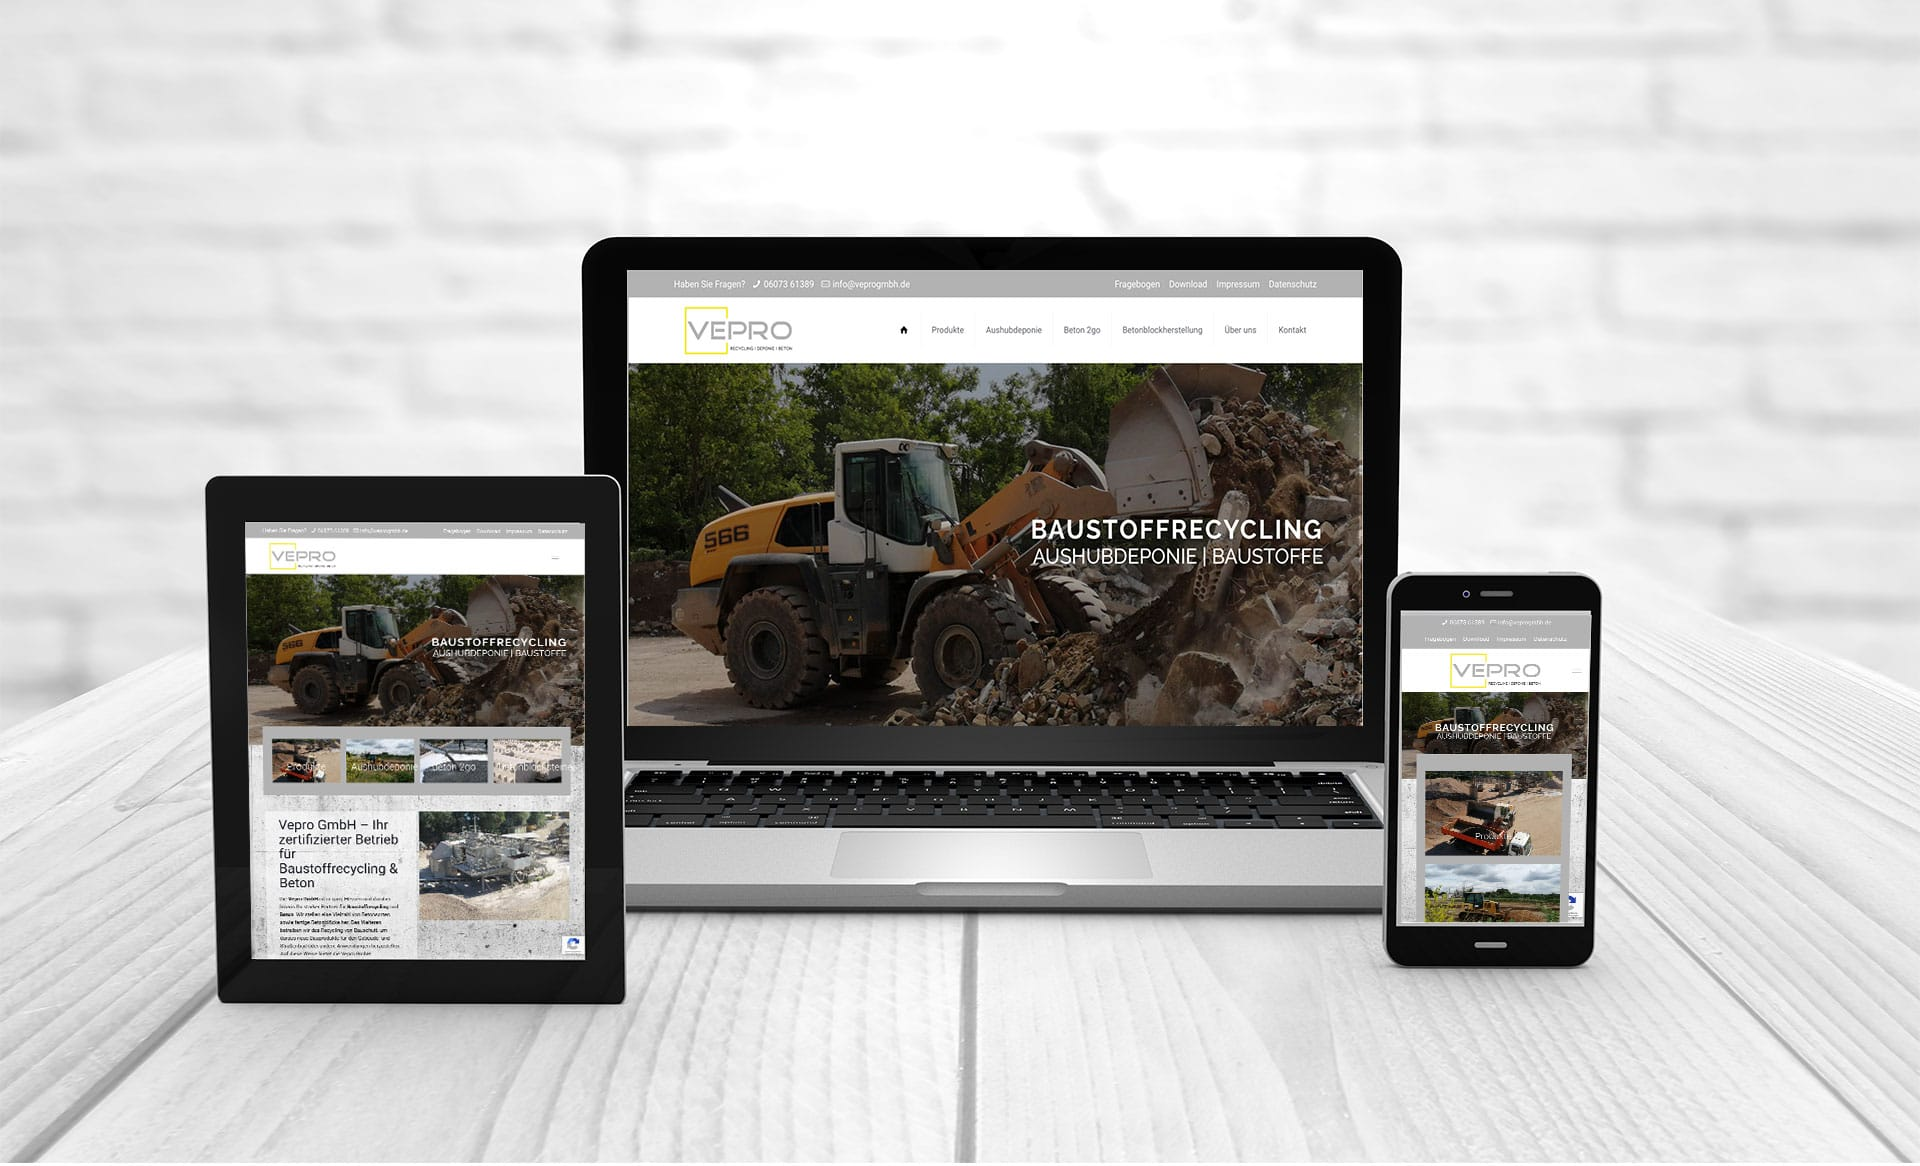 Professional web design, references Vepro-GmbH